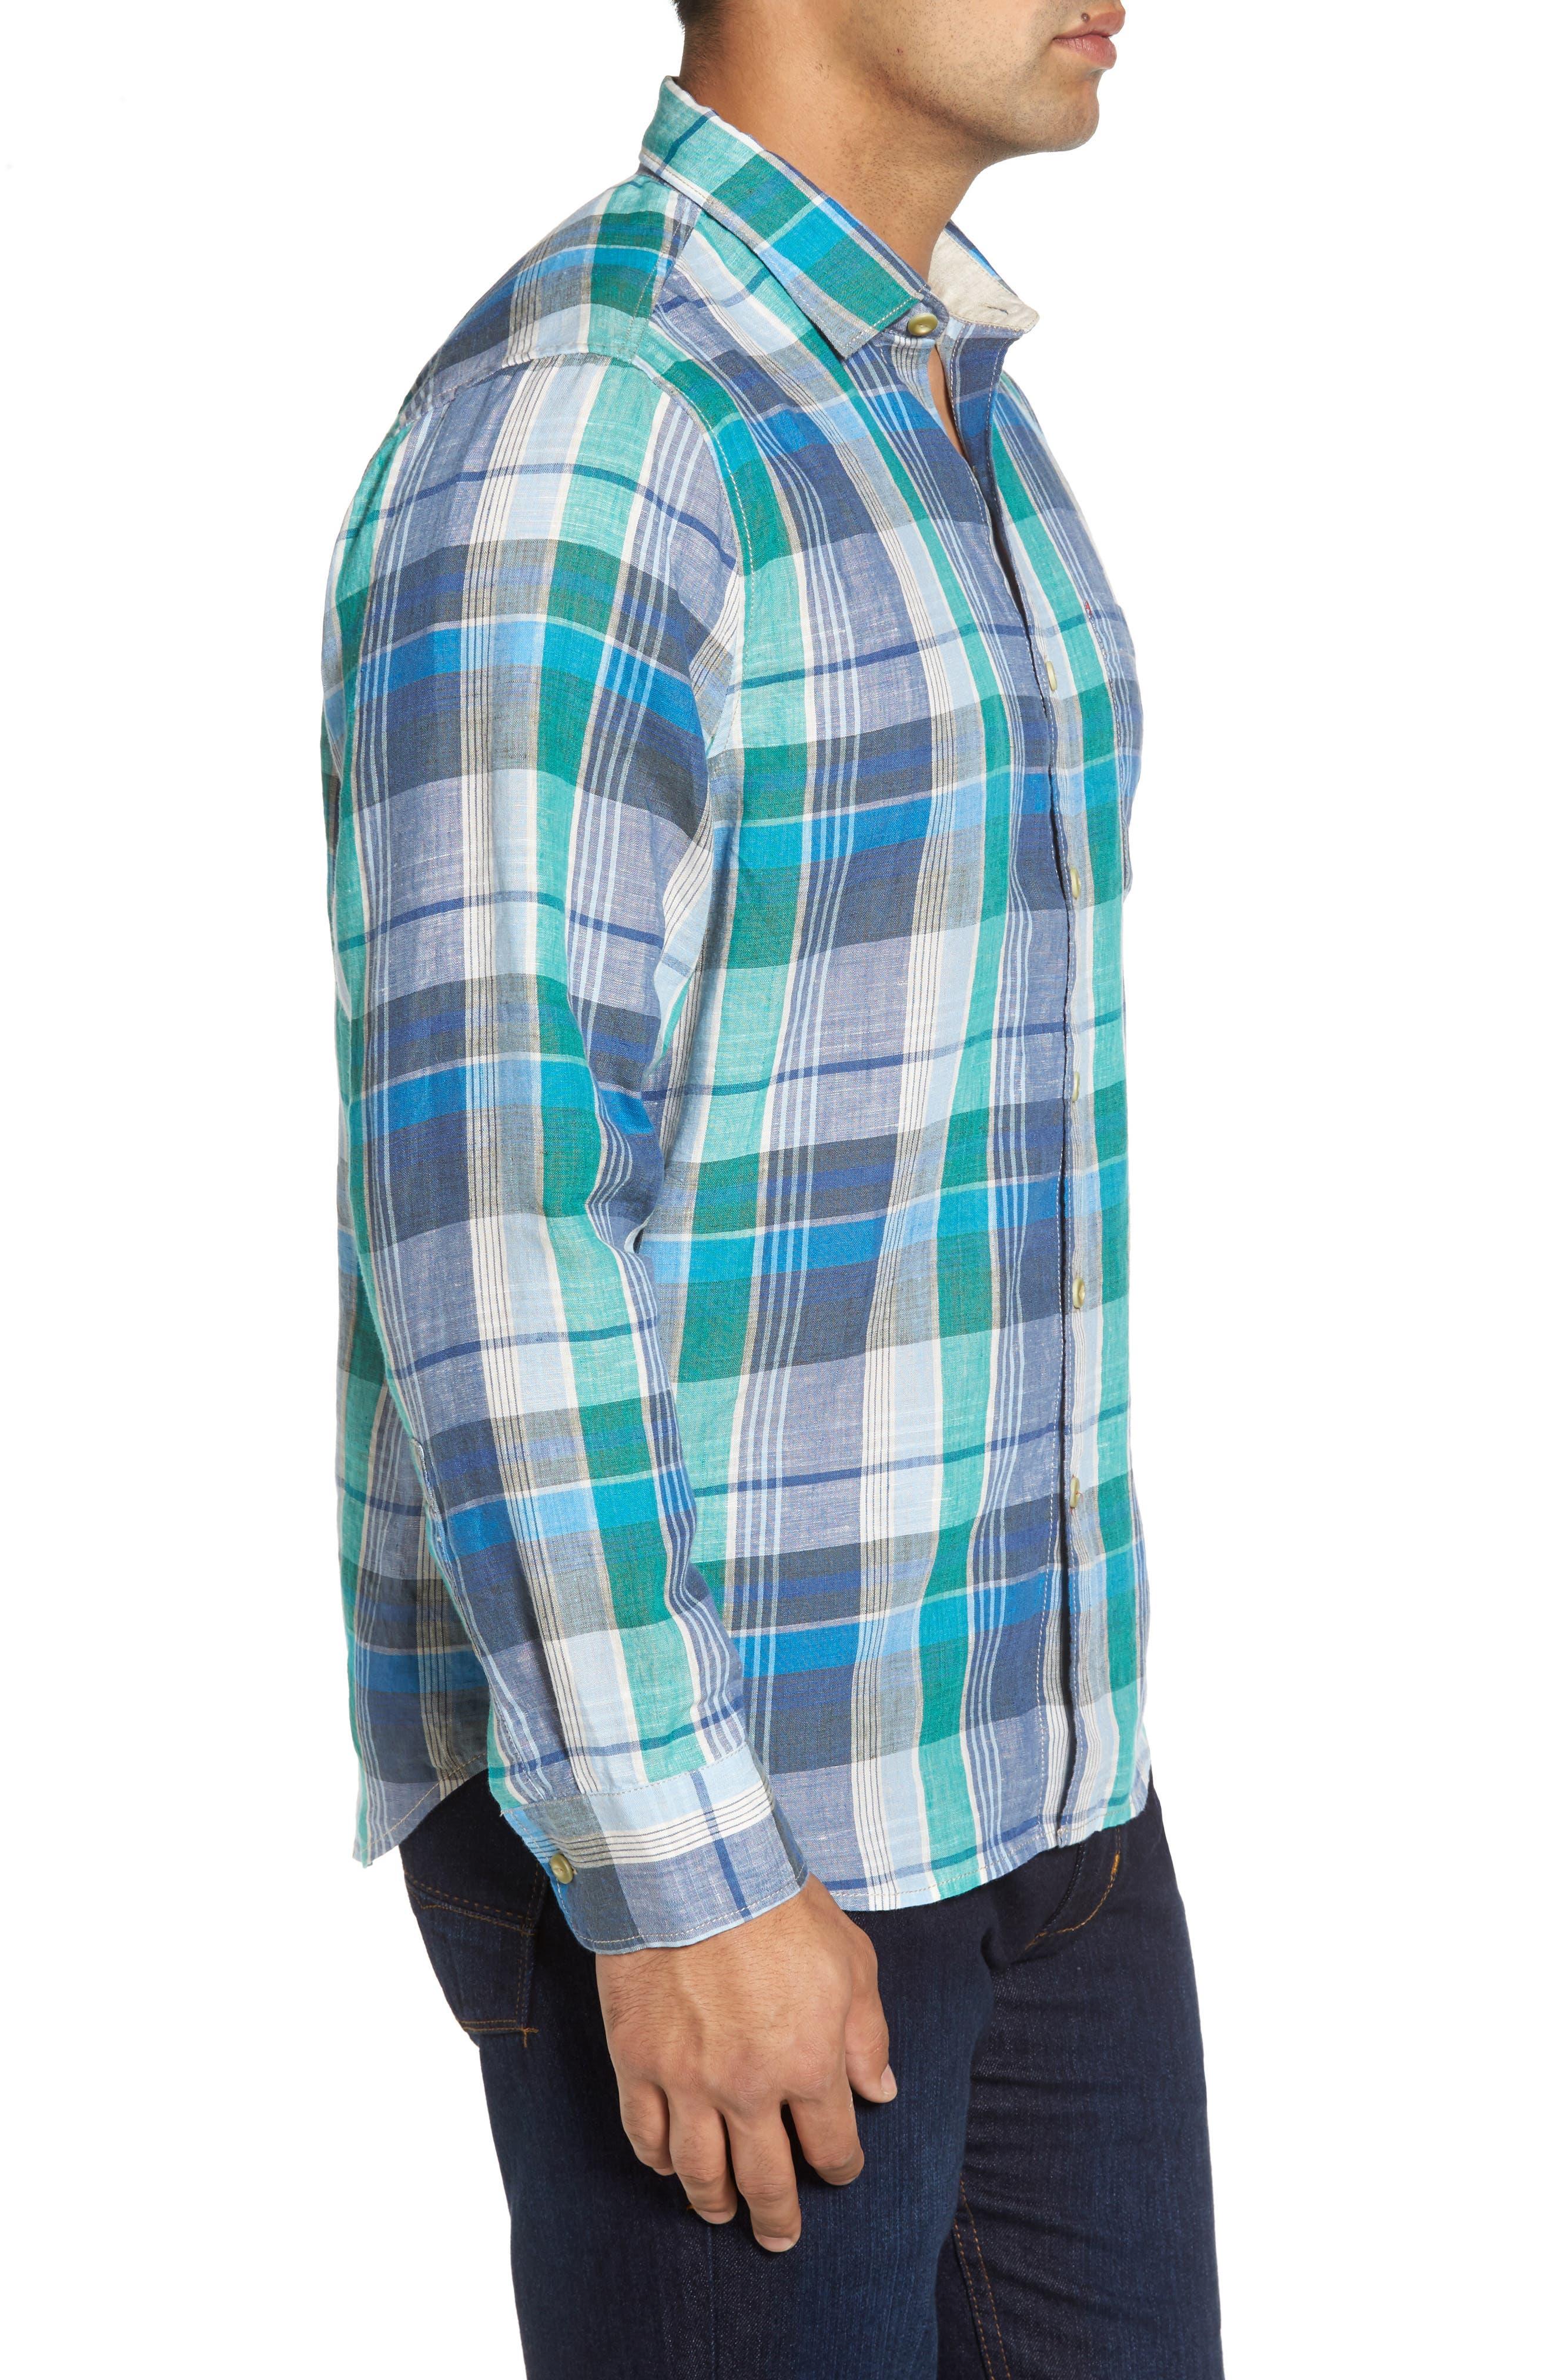 TOMMY BAHAMA,                             Vero Beach Madras Plaid Linen Sport Shirt,                             Alternate thumbnail 3, color,                             300